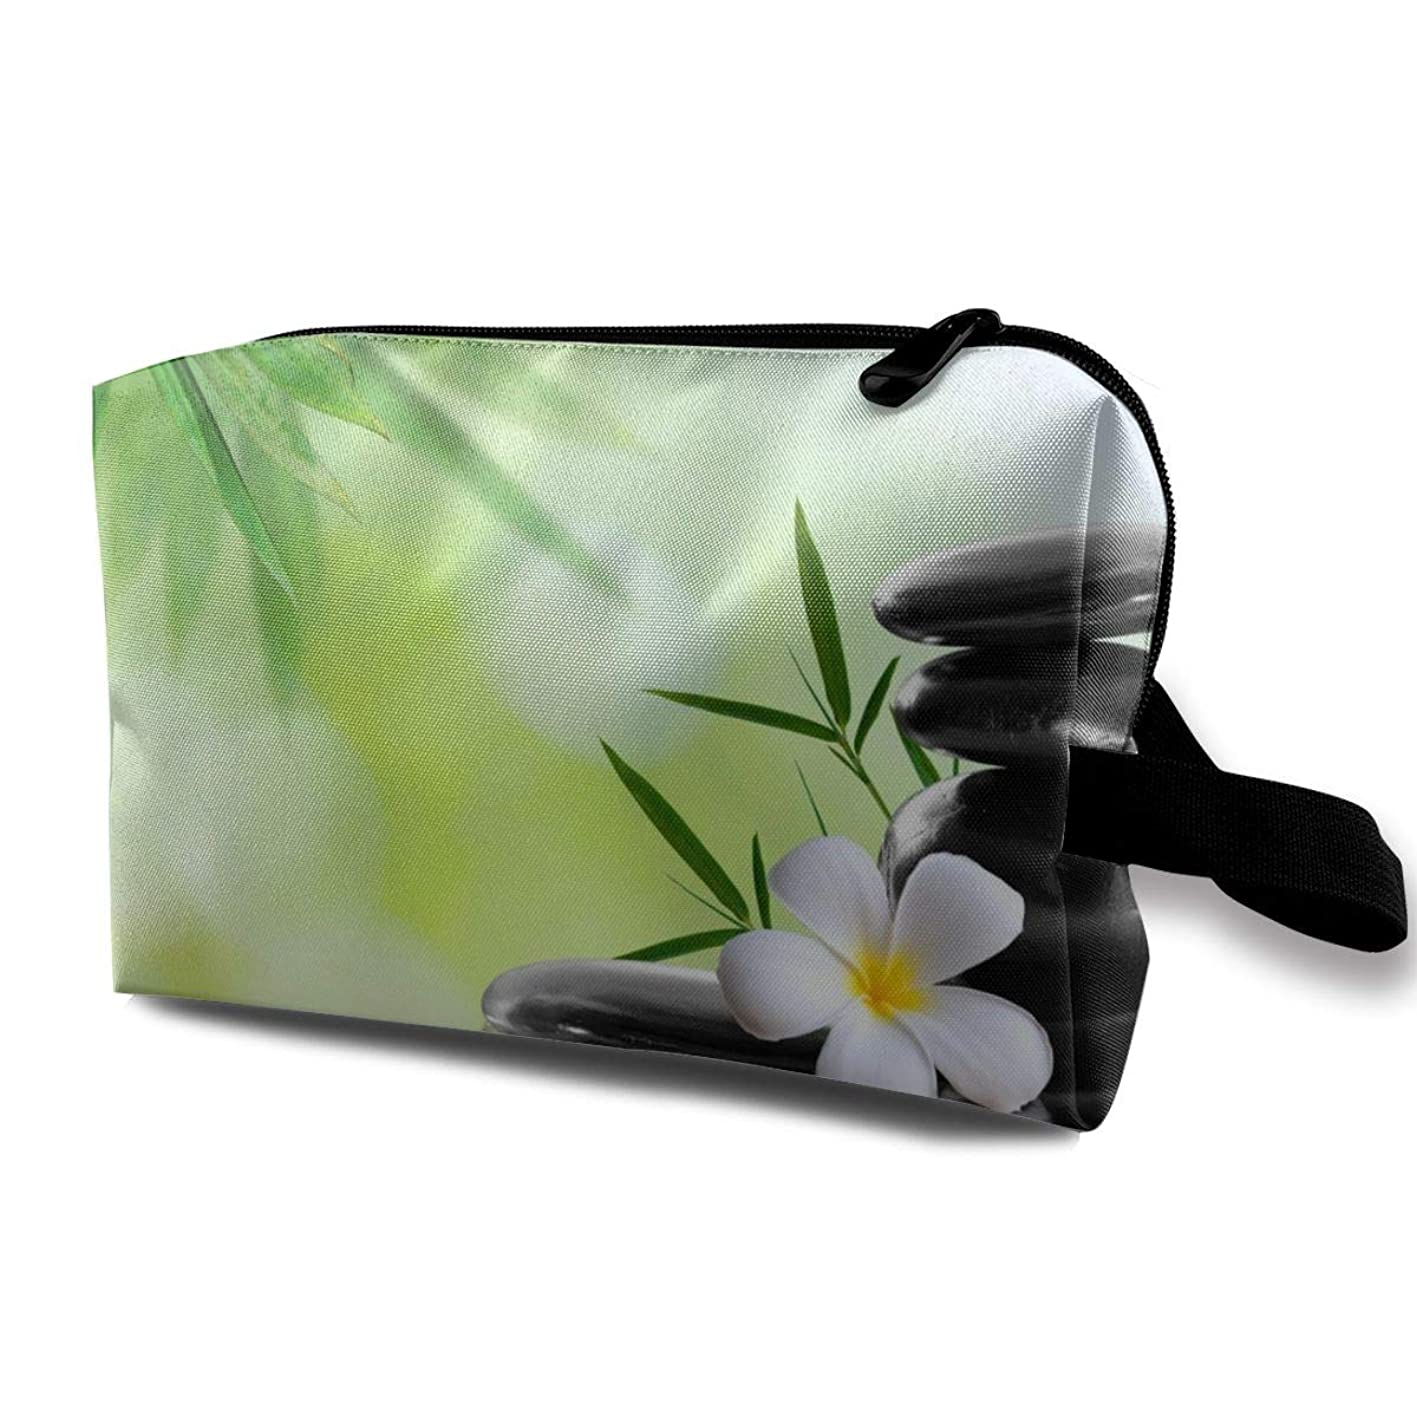 Janmhe Zoeba Spa Zen Bamboo Water Flower Portable Travel Makeup Cosmetic Bags OrganizerMultifunction Pouch Case Toiletry Bags focxbnwvjtu275